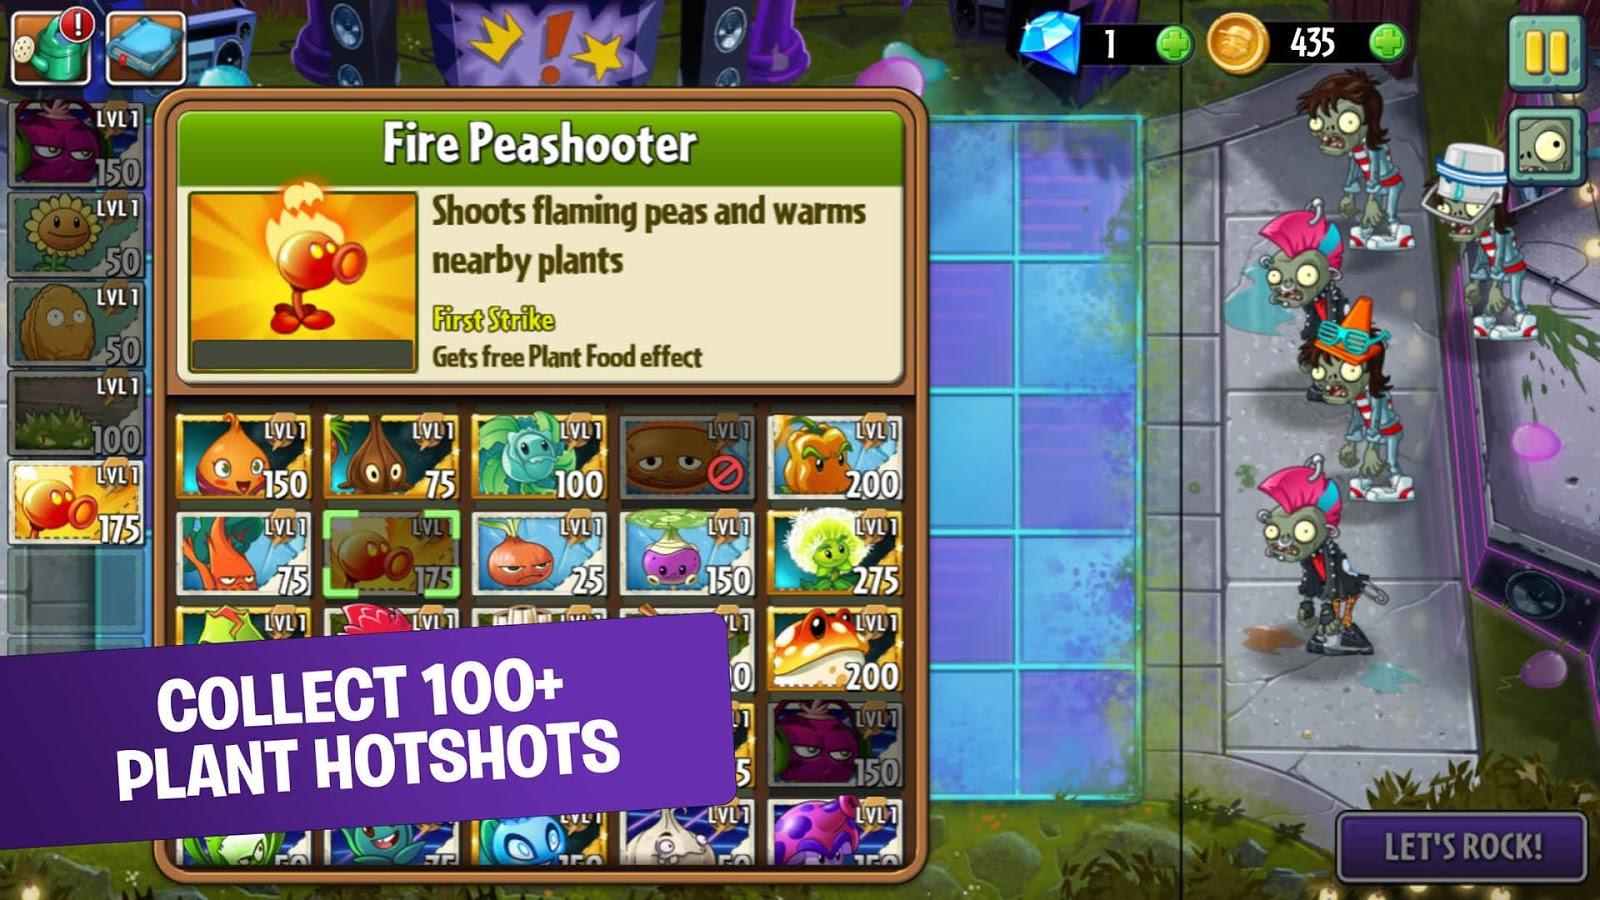 Plants vs zombies 2 681 apk download android casual games plants vs zombies 2 681 screenshot 8 toneelgroepblik Gallery